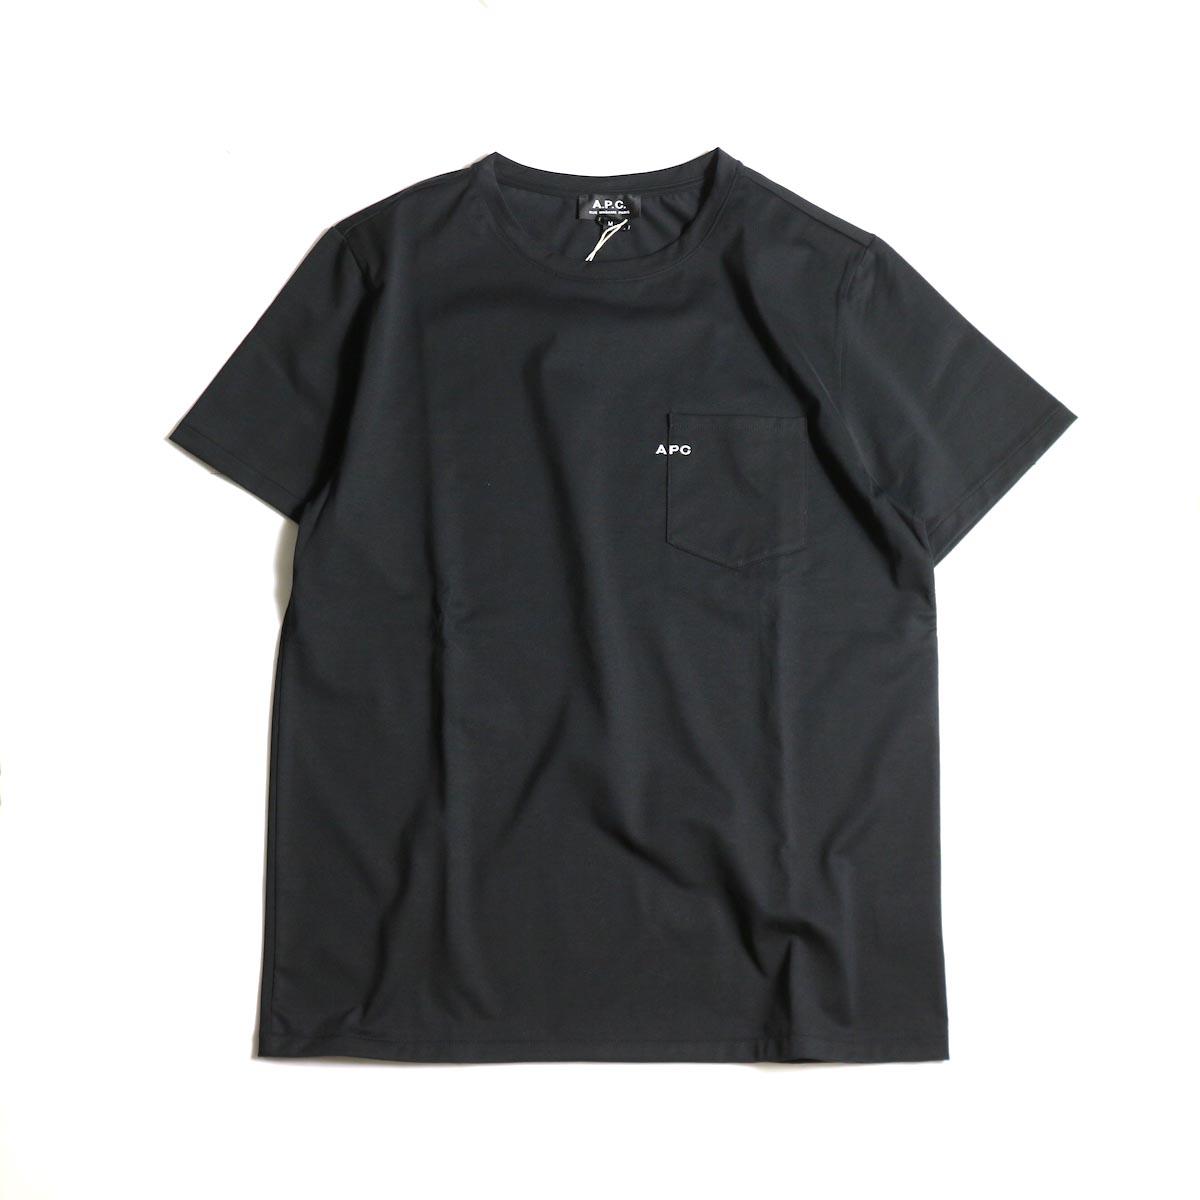 A.P.C. / Crew Neck Emb Pocket Tee -Black